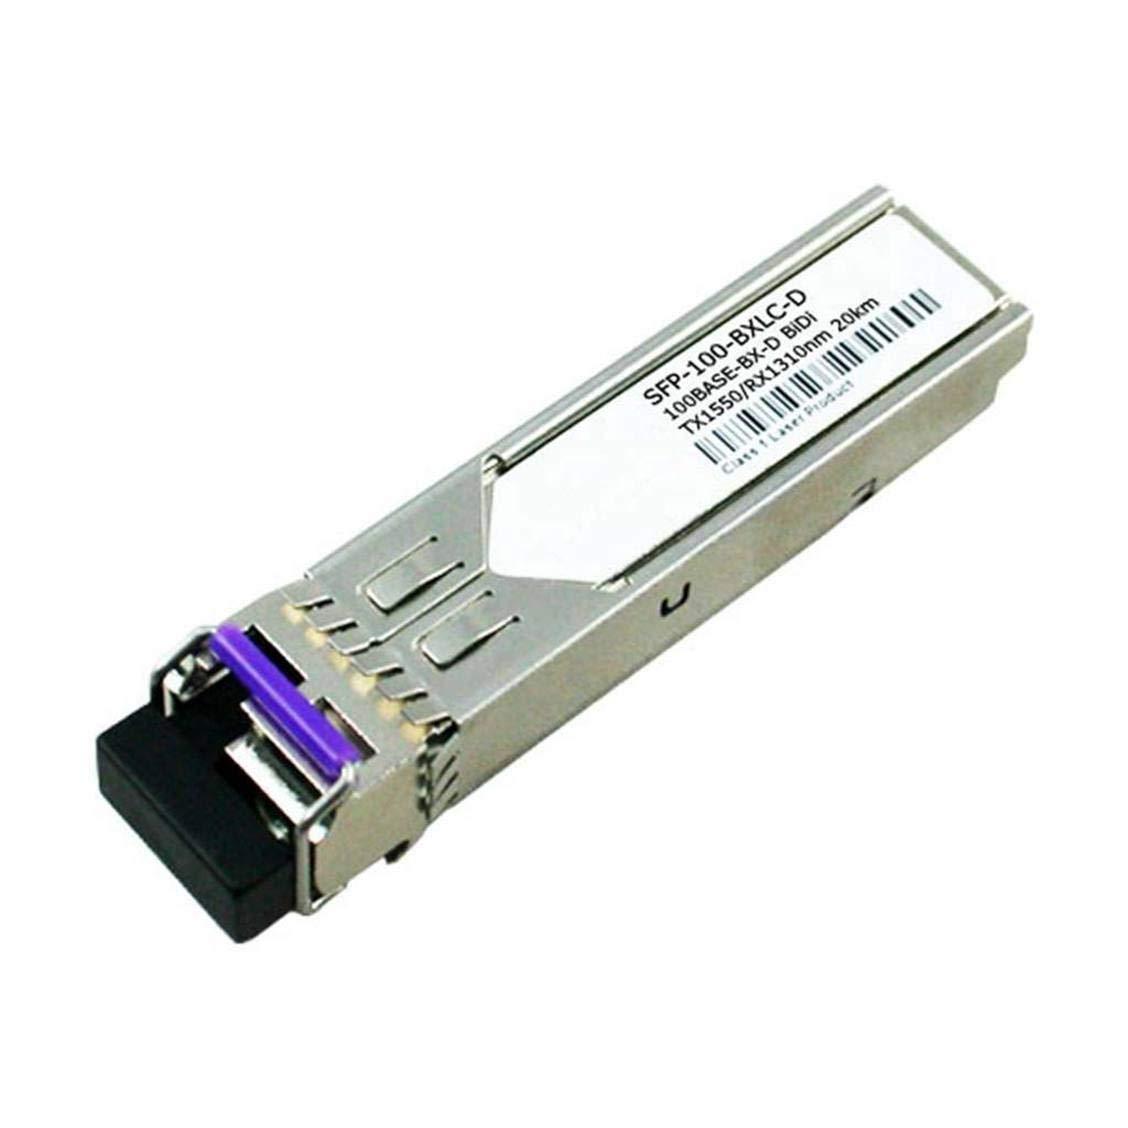 Axiom 100BASE-FX SFP for Allied Telesis